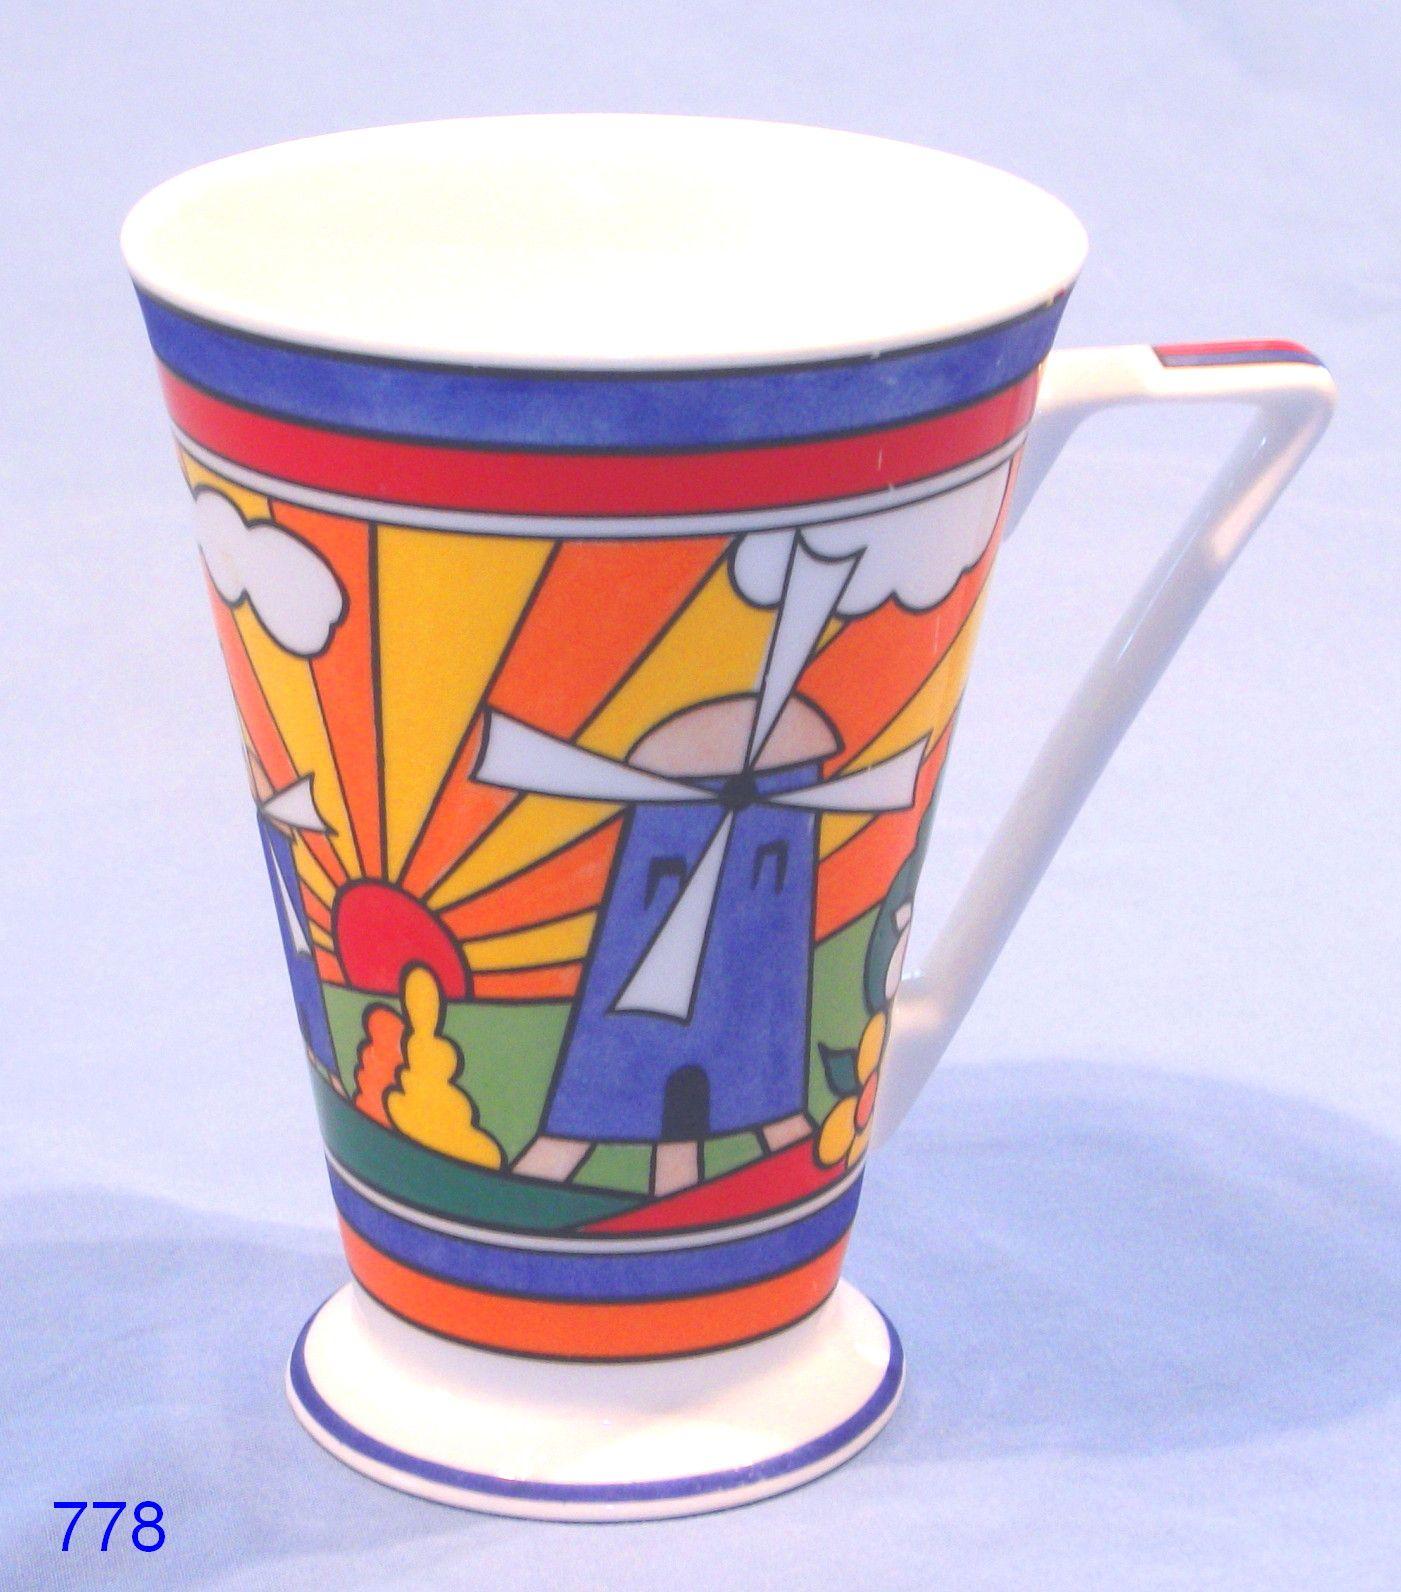 Art Deco Clarice Cliff Style Sunburst Mug By Wren Clarice Cliff Pottery Art Art Deco